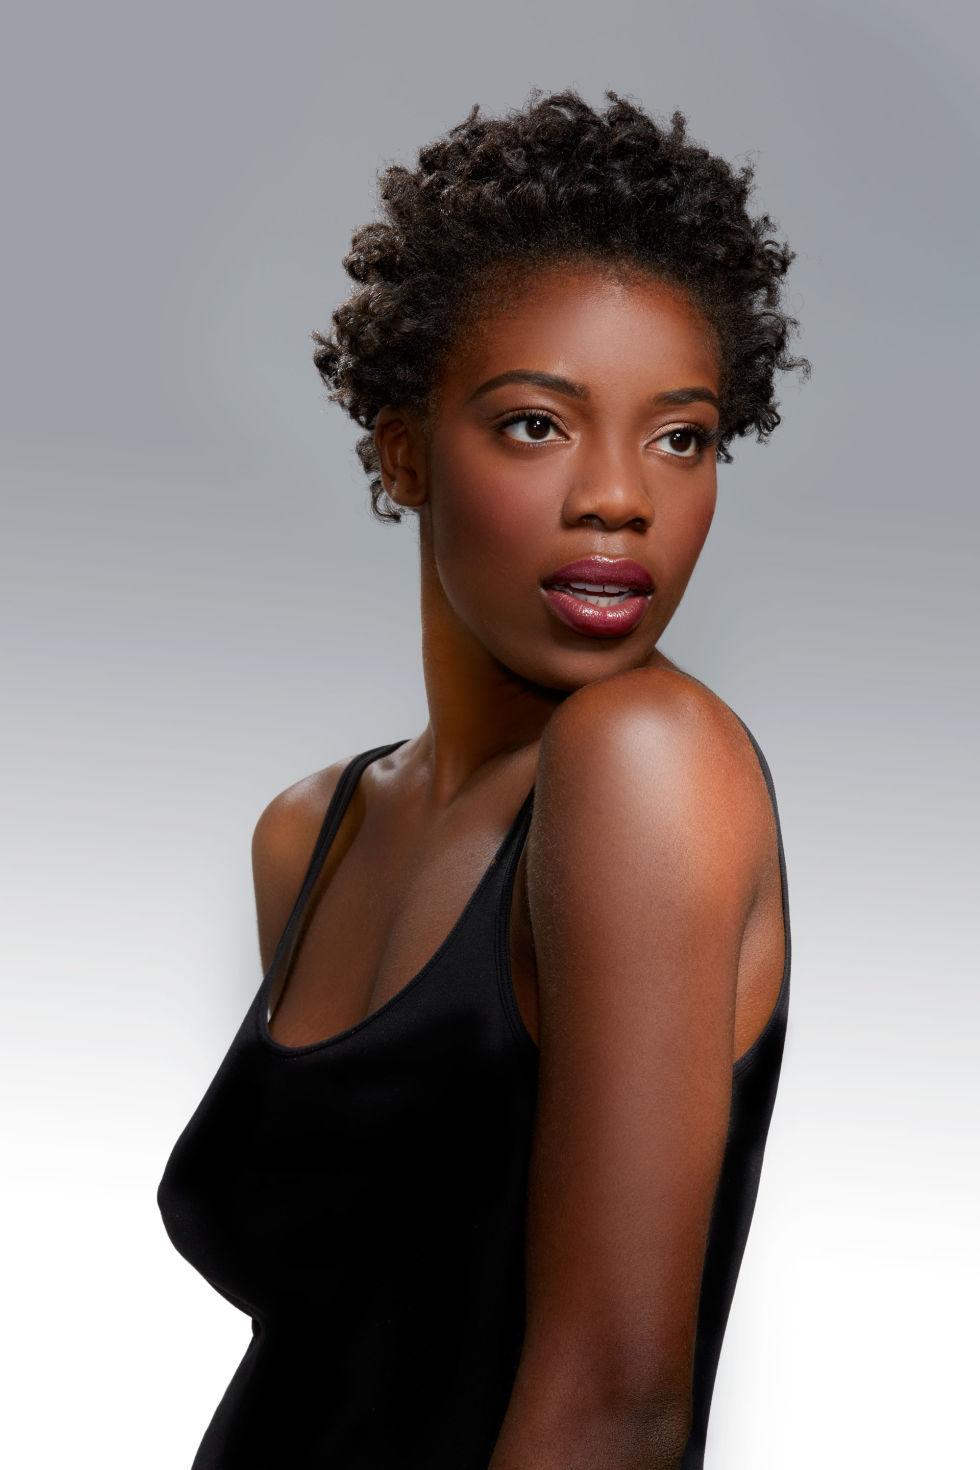 Terrific 29 Black Hairstyles Best African American Hairstyles Amp Haircuts Short Hairstyles Gunalazisus